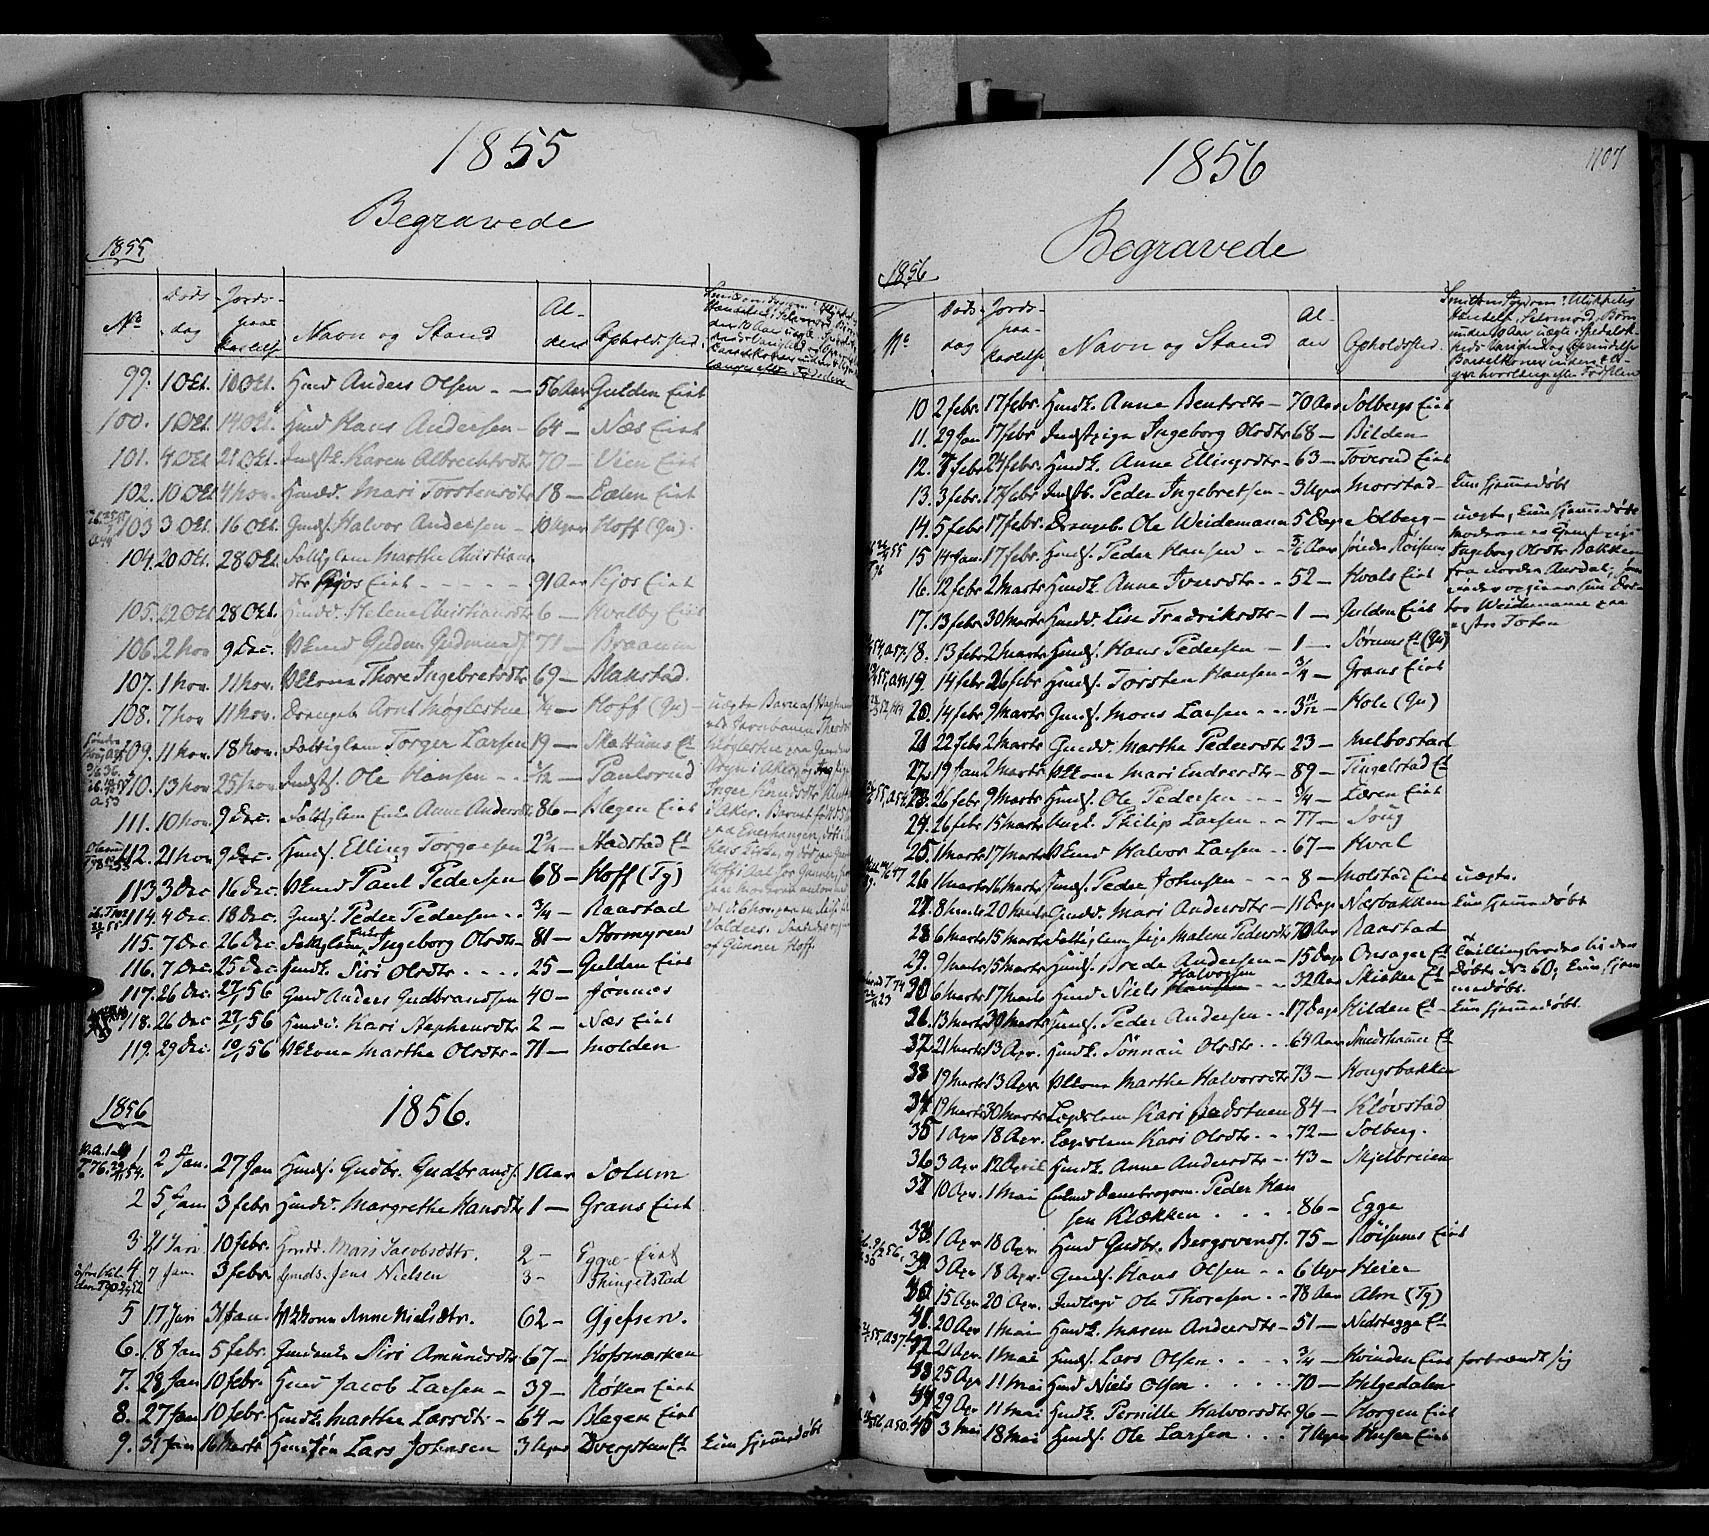 SAH, Gran prestekontor, Ministerialbok nr. 11, 1842-1856, s. 1106-1107